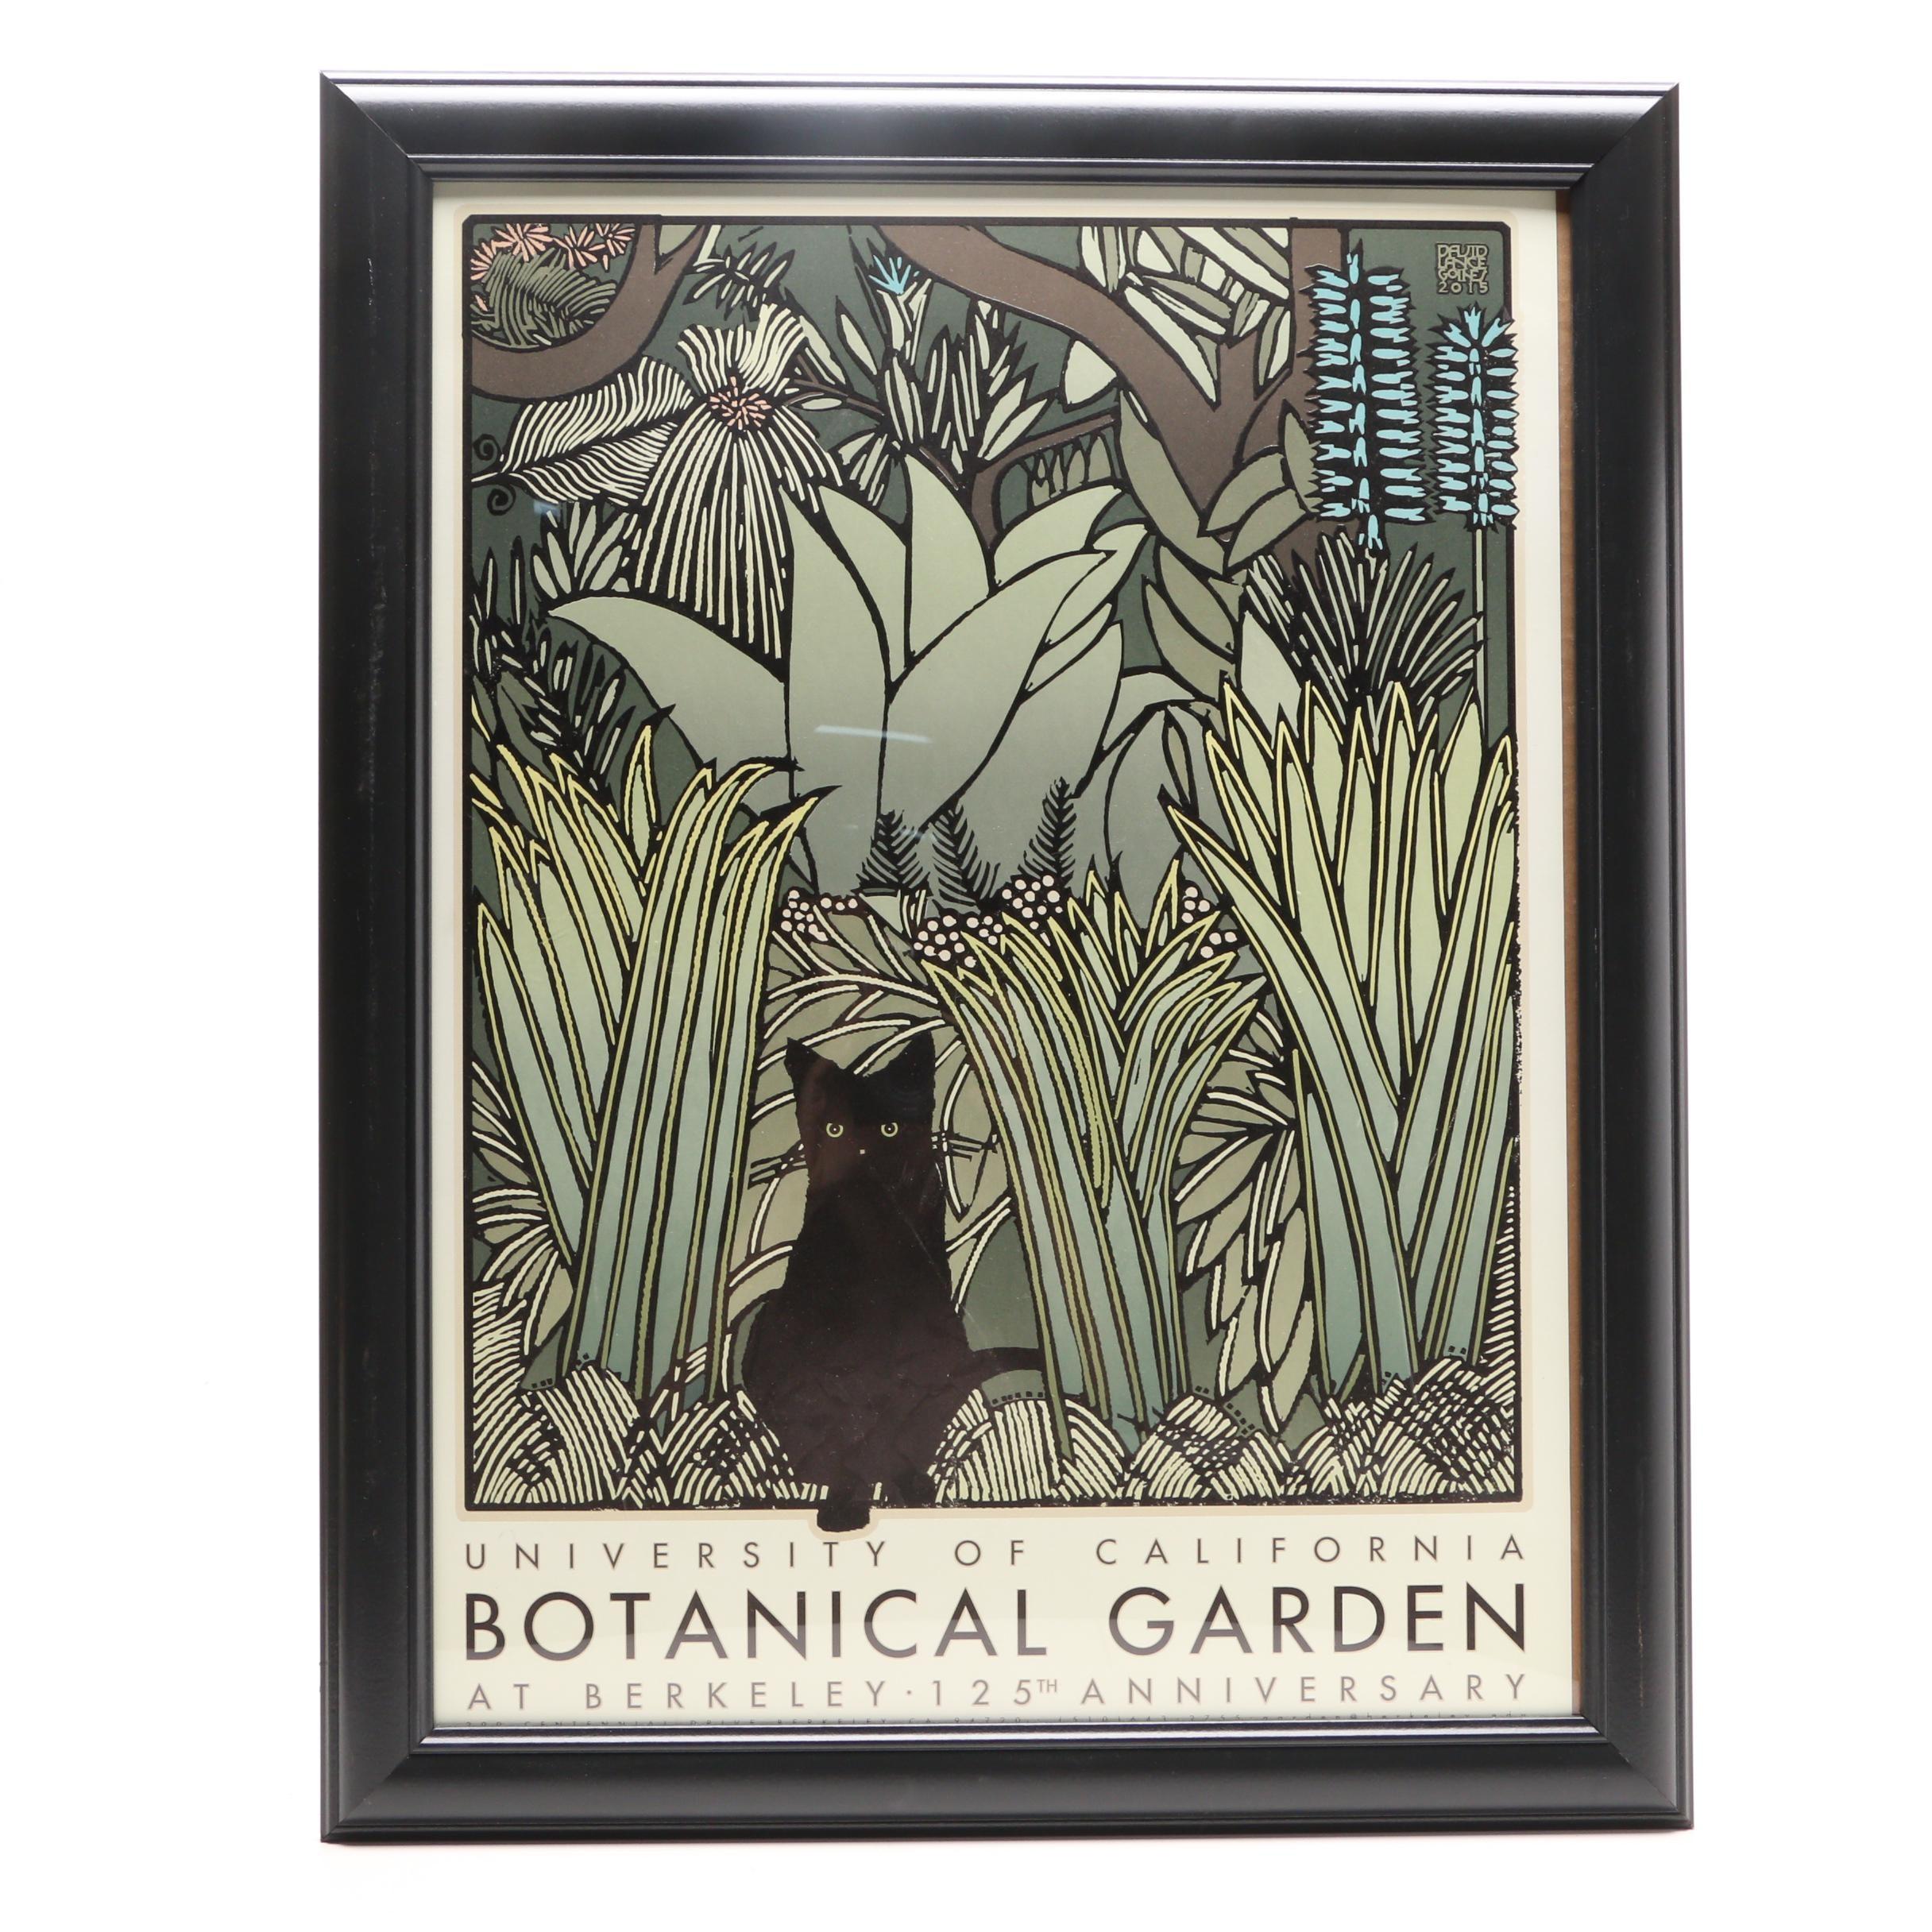 David Goines Serigraph Poster for University of California Bontanical Garden